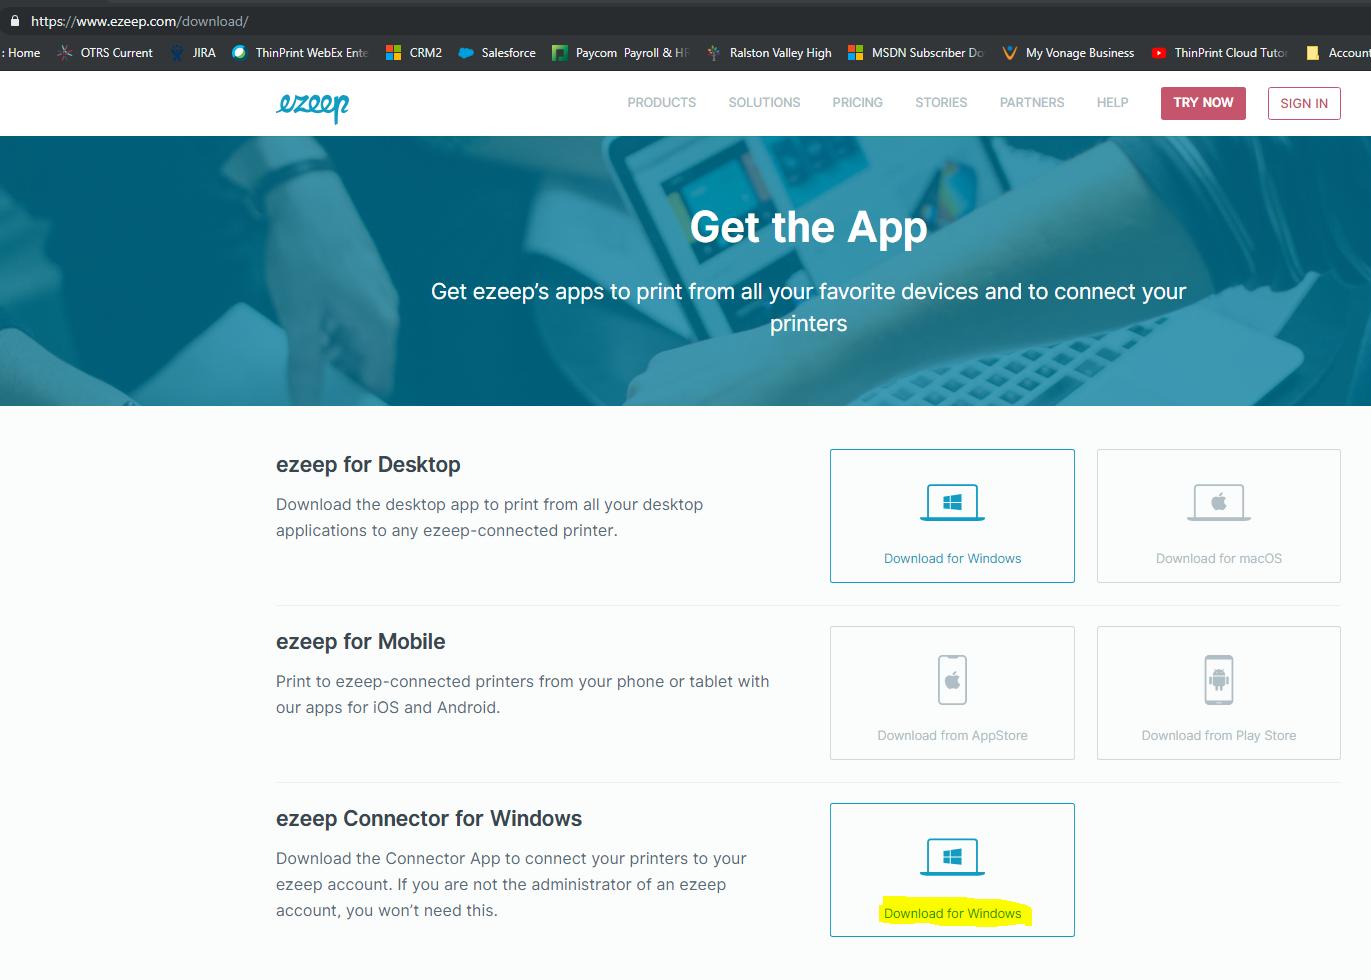 screenshot: download ezeep connector